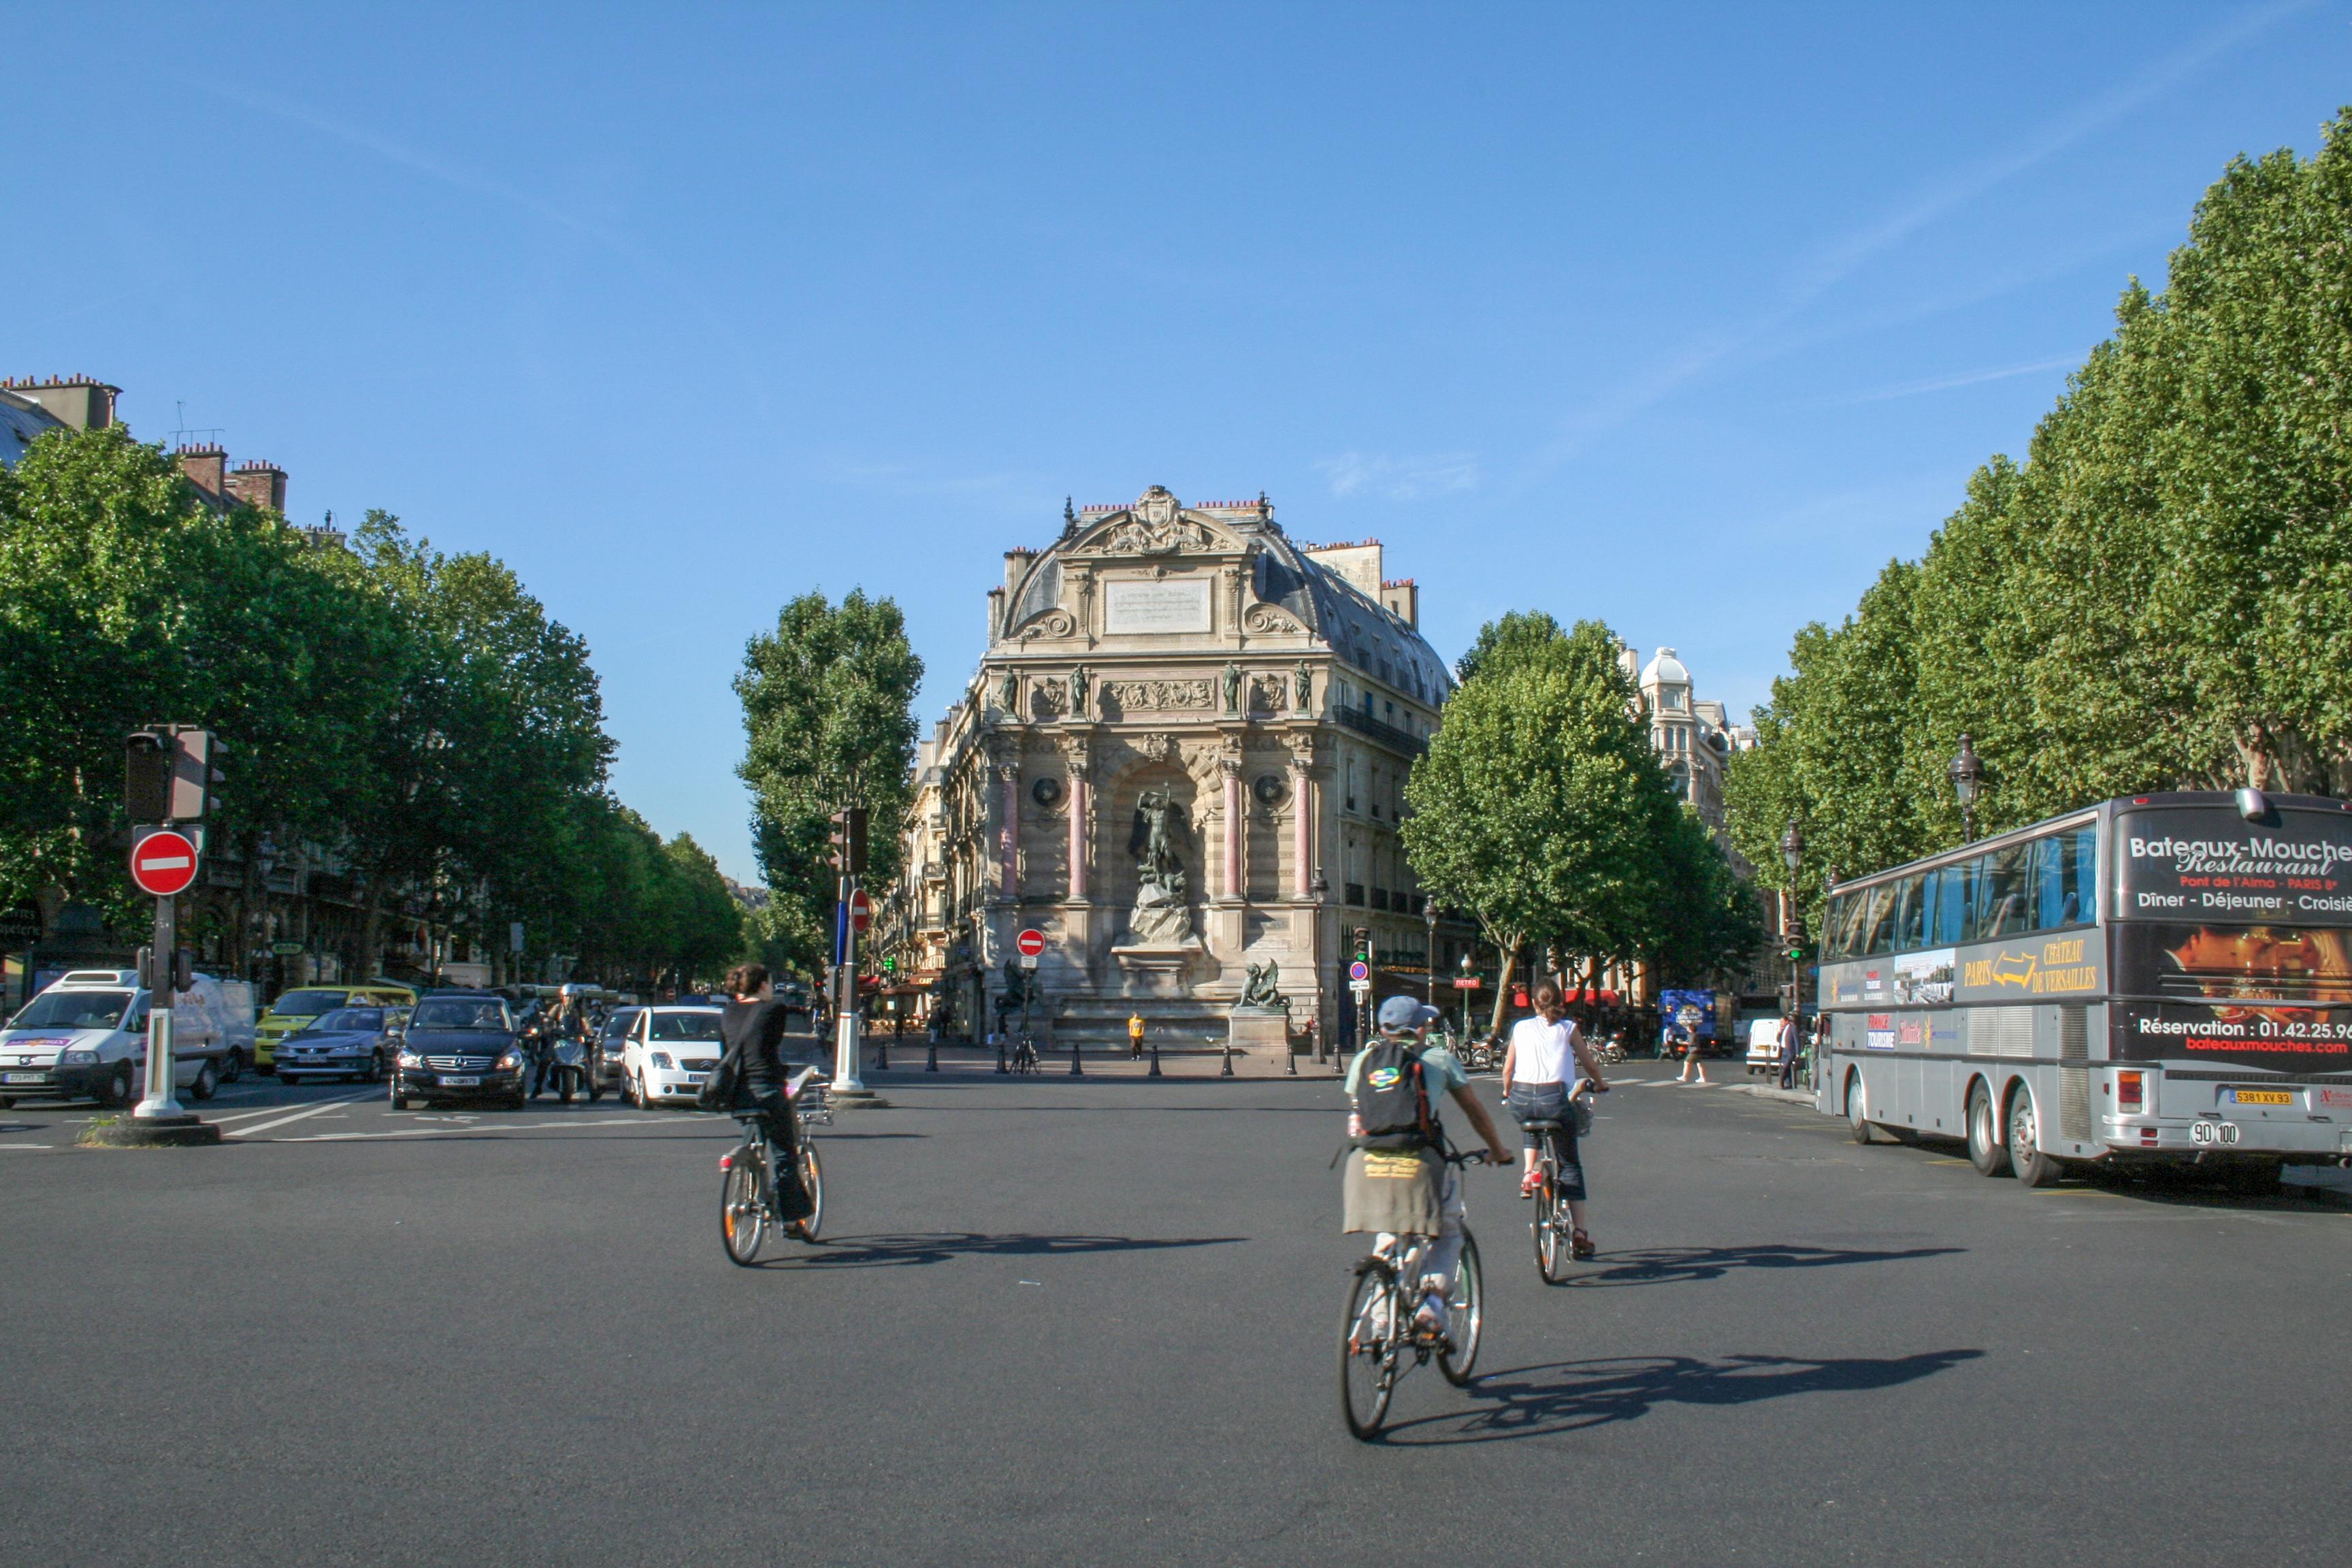 Saint Michel Paris France Saint-michel Paris France